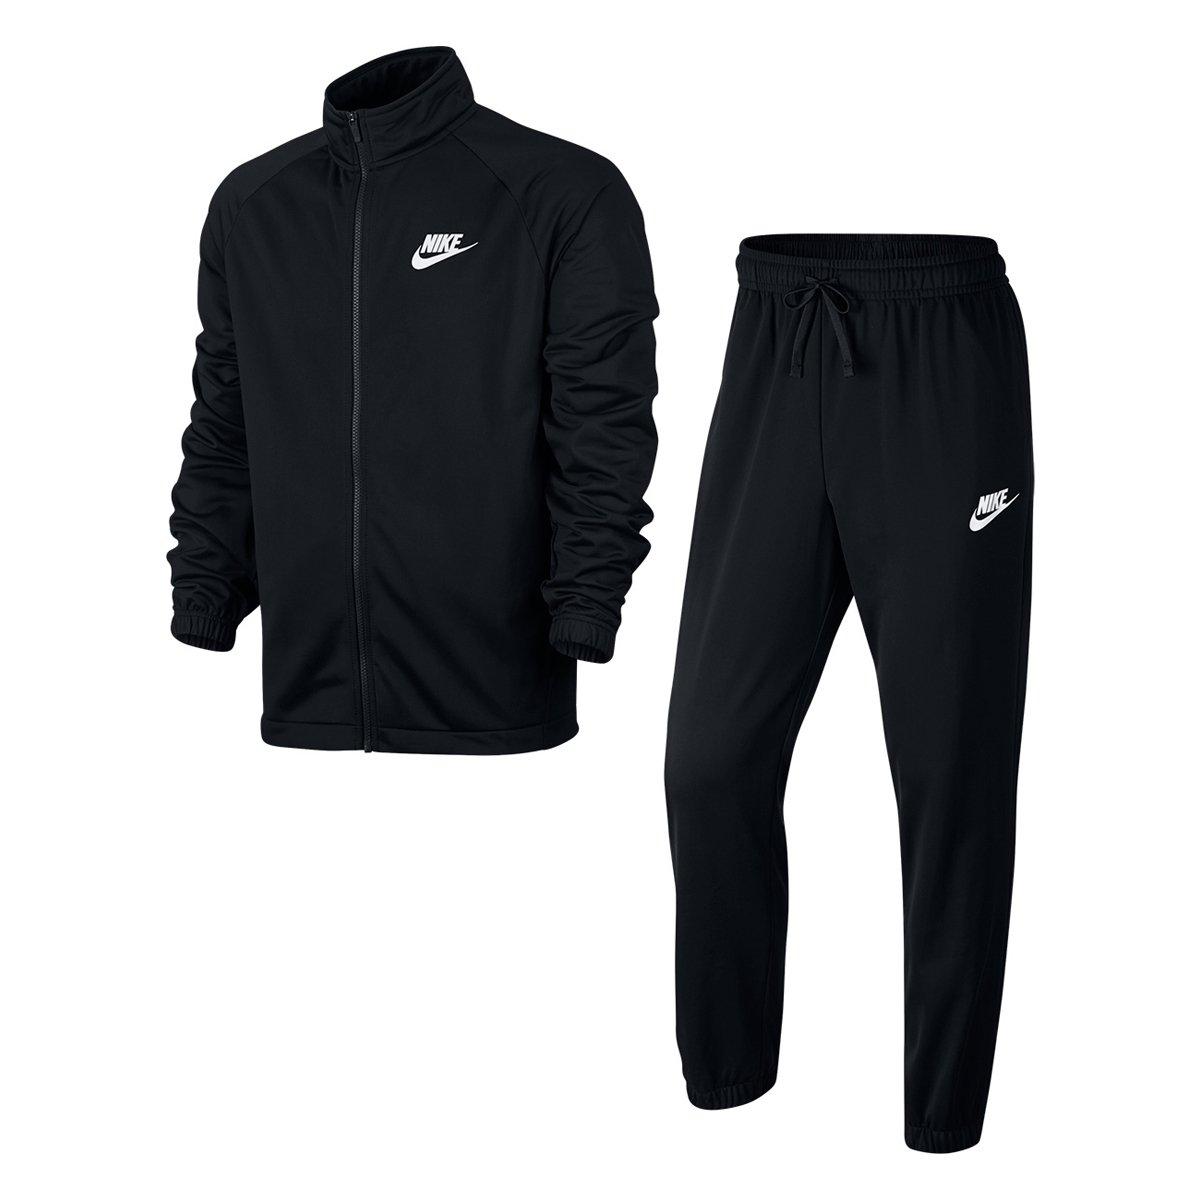 07afe6ebb5 Agasalho Nike Trk Suit Pk Basic Masculino - Preto e Branco - Compre Agora